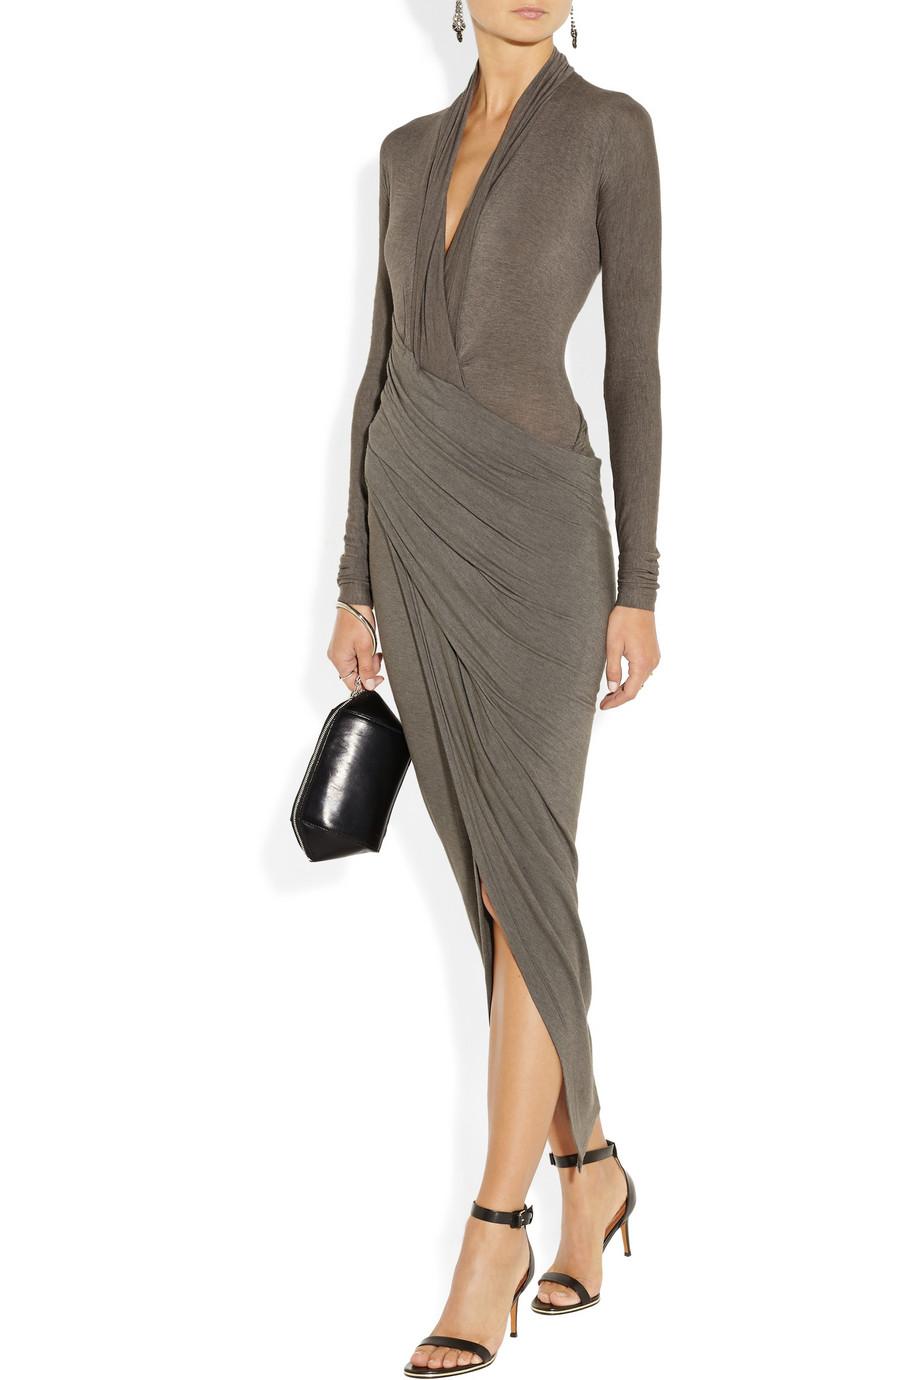 Lyst Donna Karan Draped Wrapeffect Jersey Dress In Gray